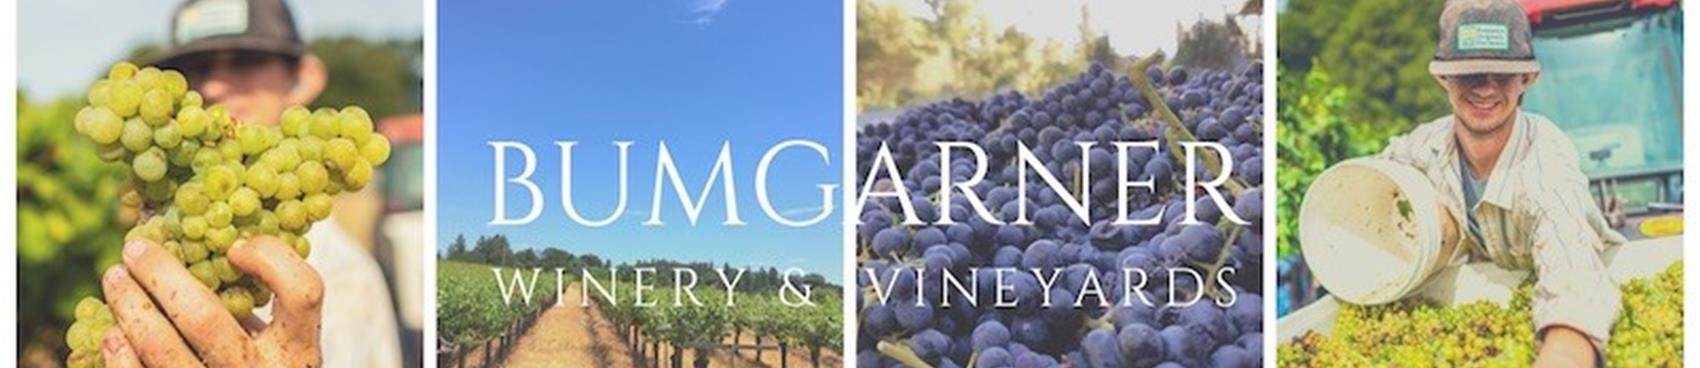 Bumgarner Winery